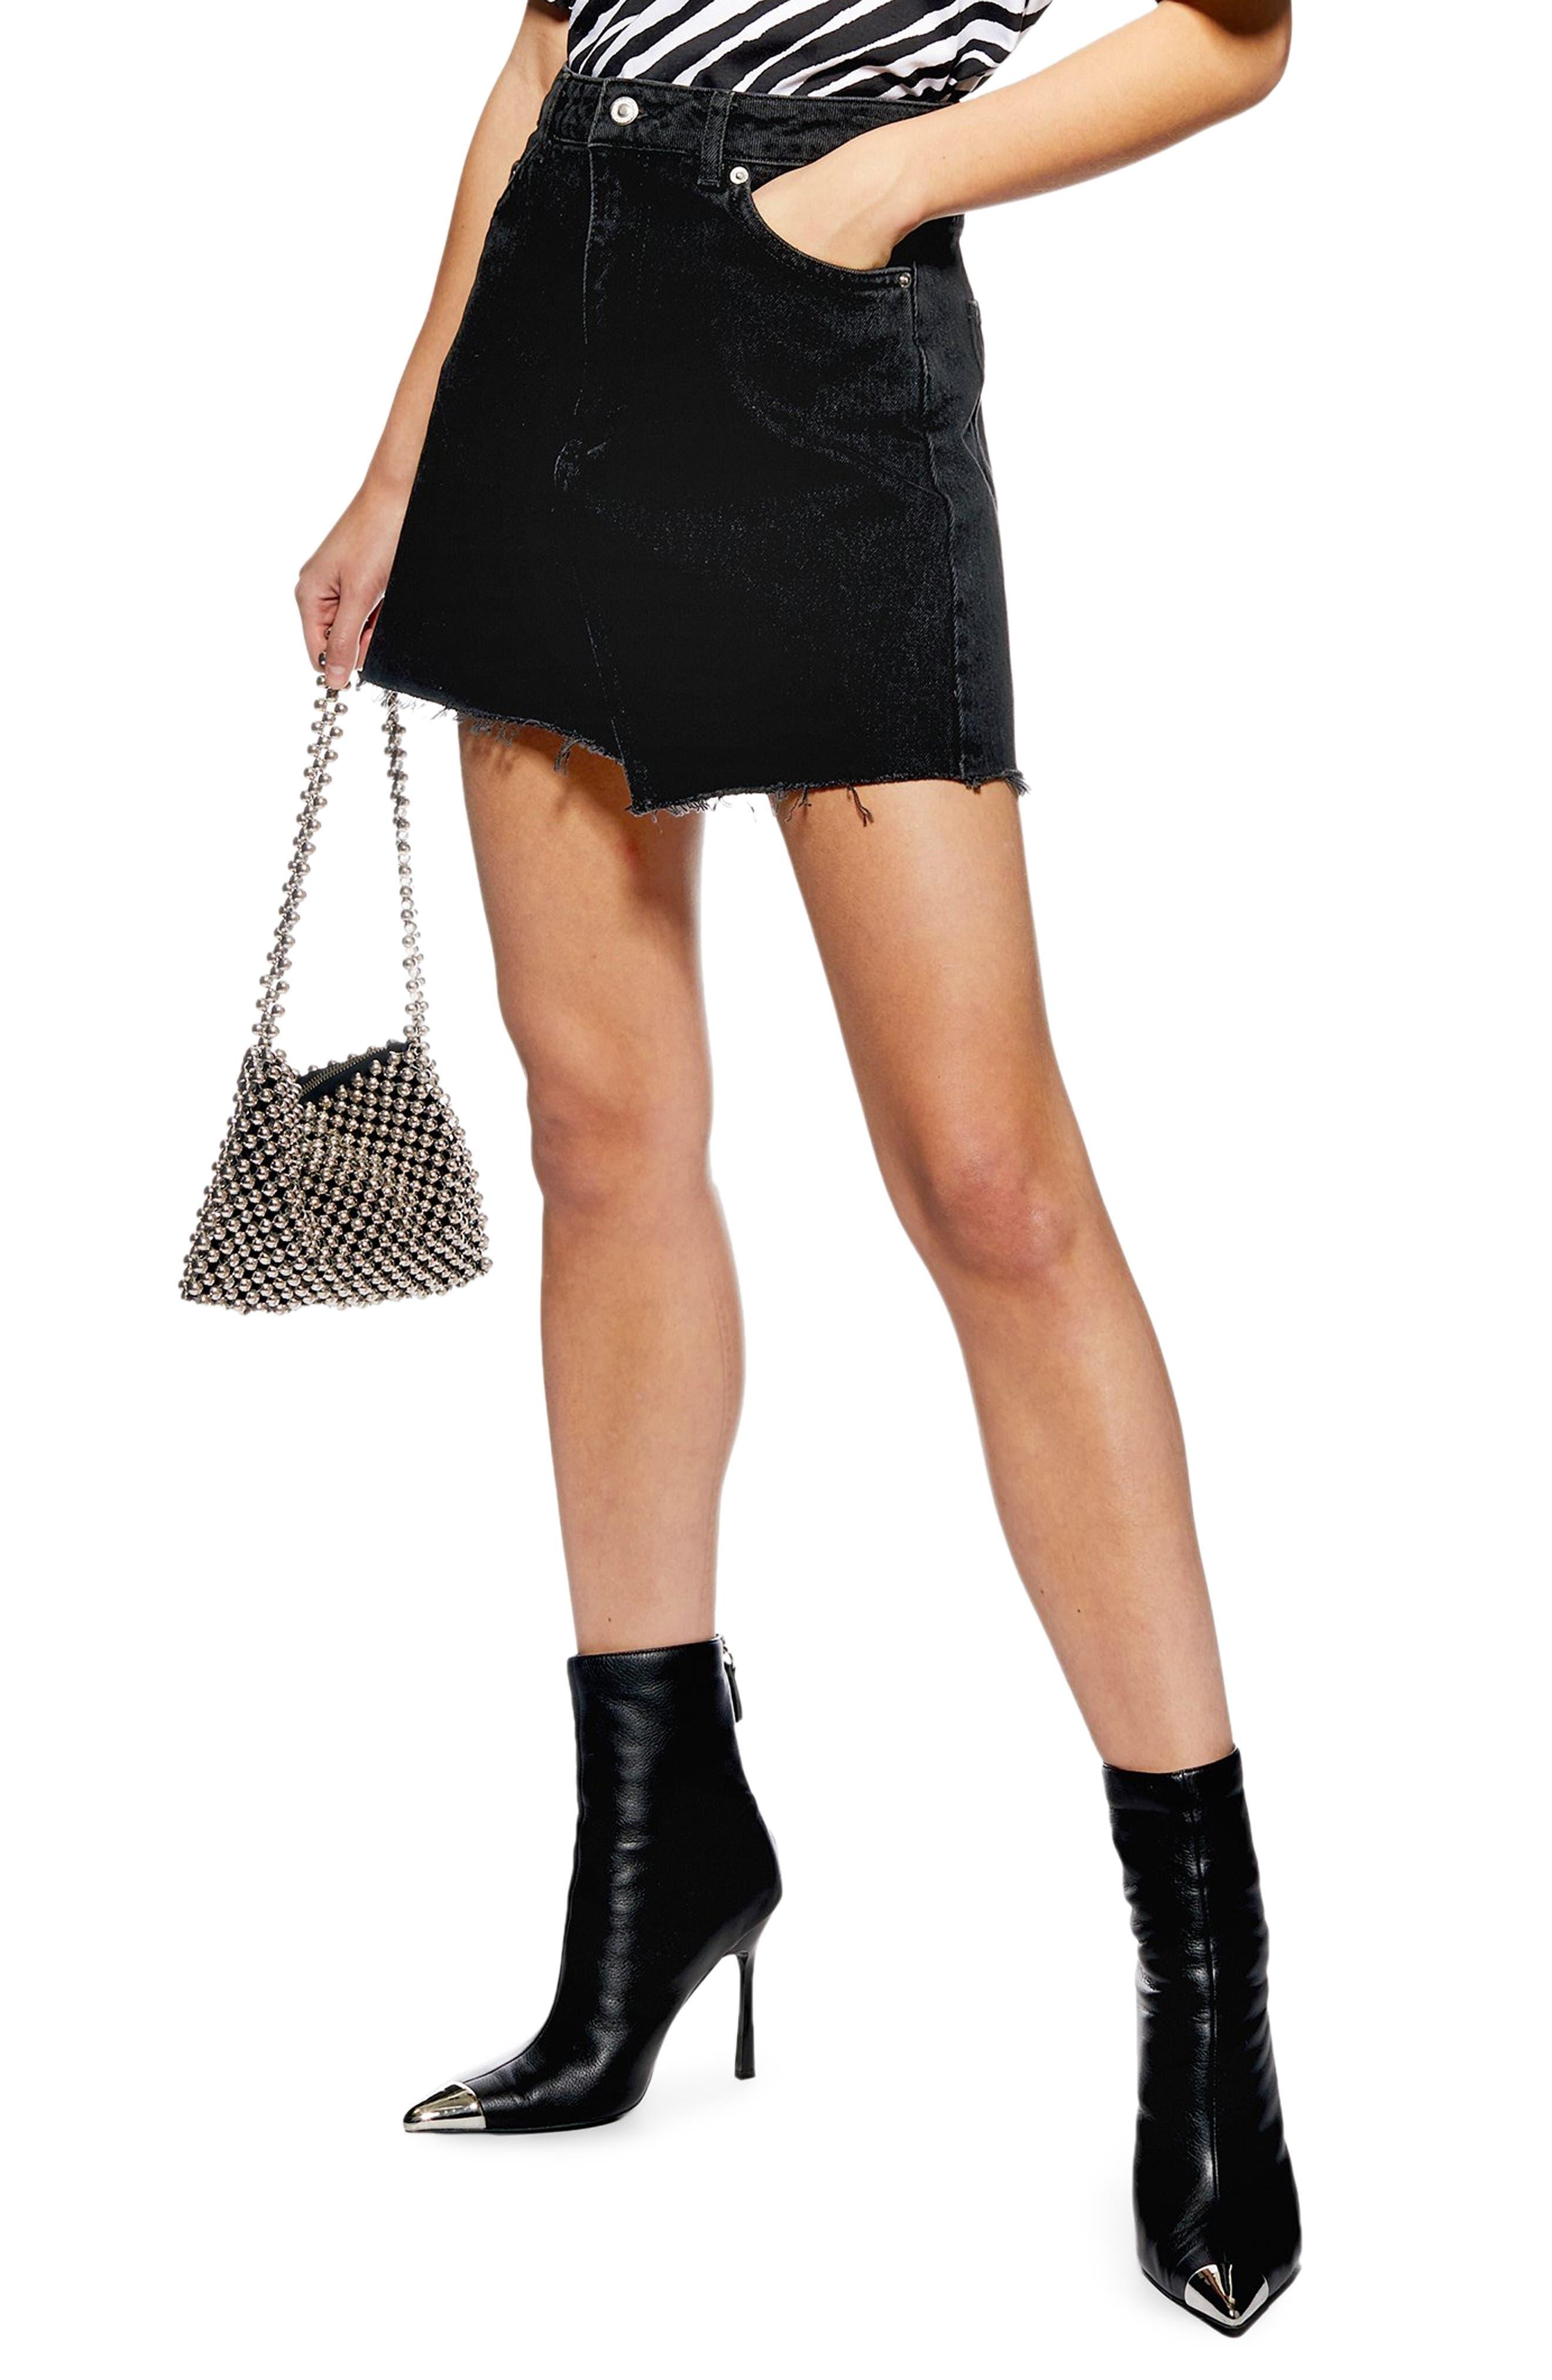 Topshop Asymmetrical Denim Miniskirt, US (fits like 10-12) - Black